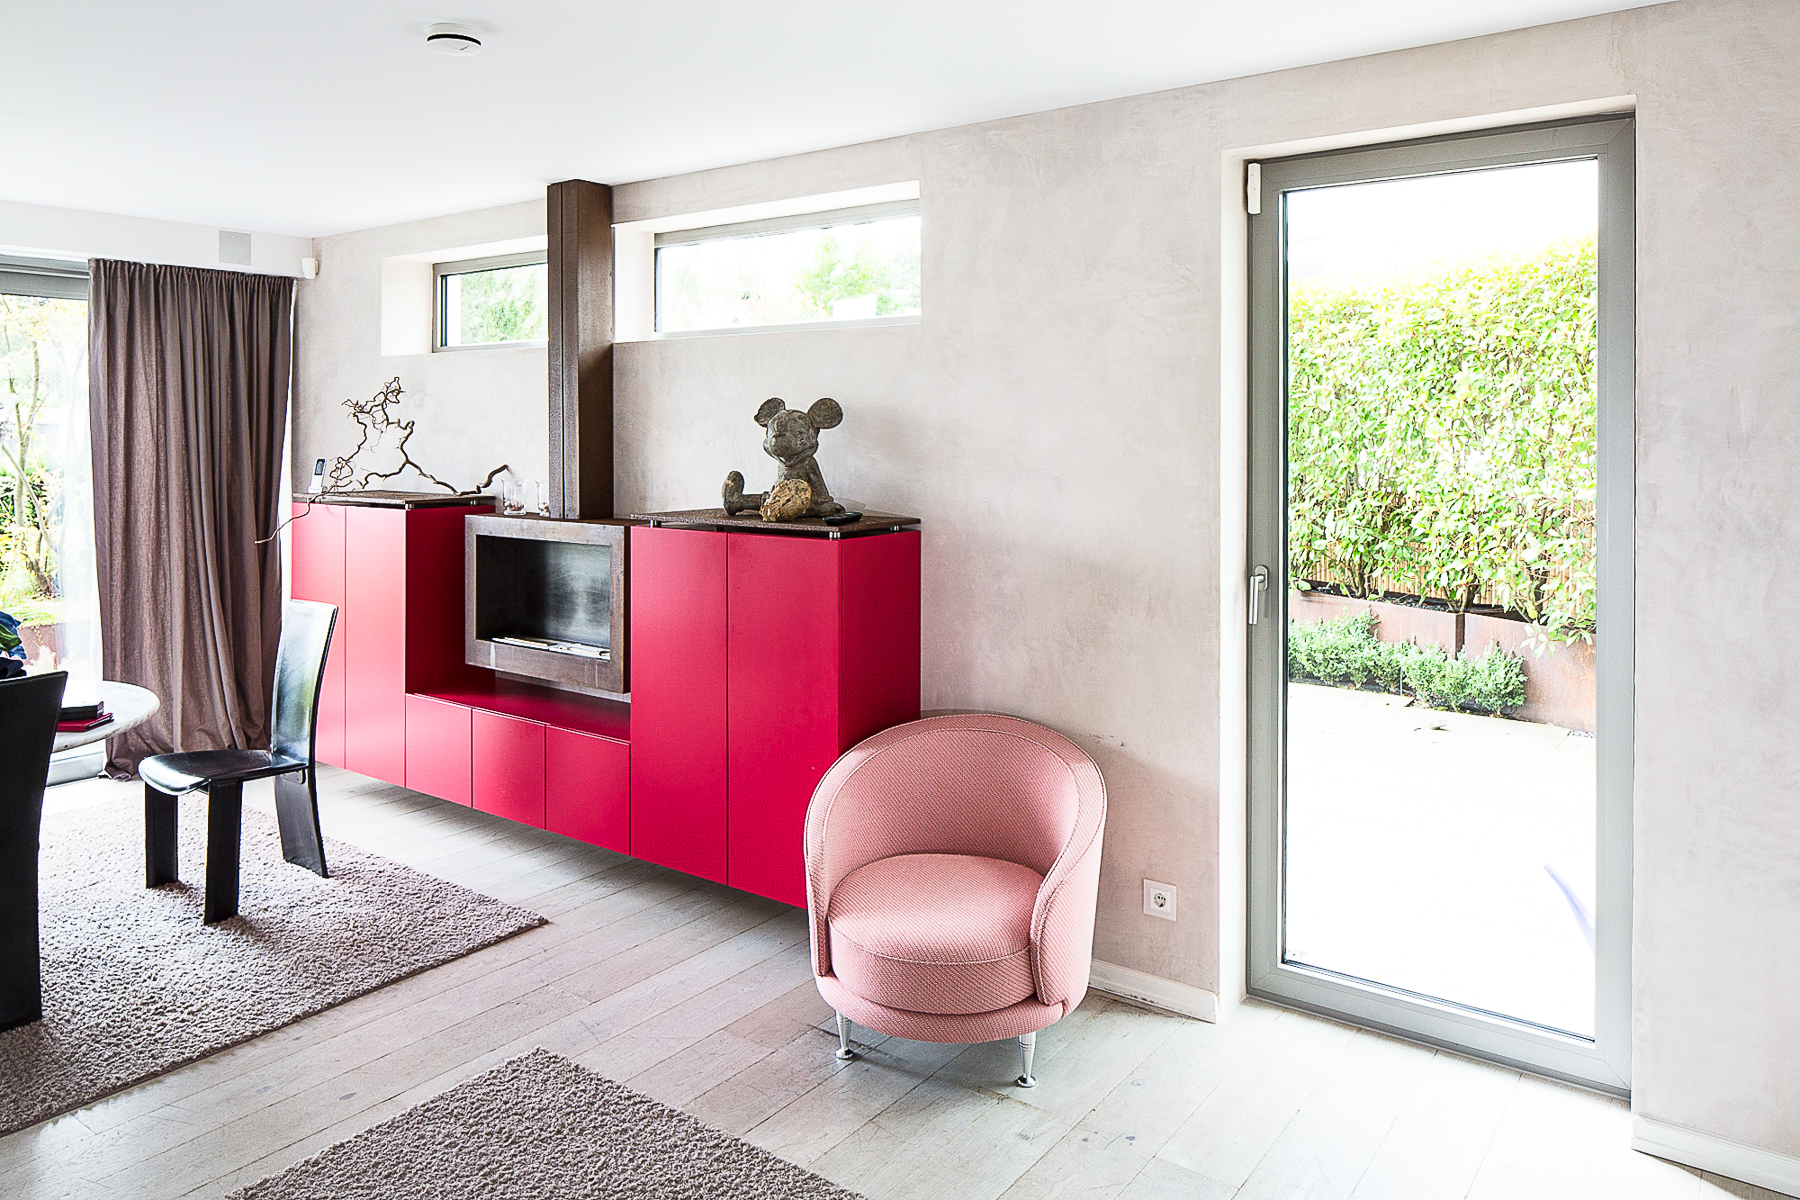 Apartamento para Venda às High End Apartment with Magnificent Garden Wiesbaden, Hessen, 65193 Alemanha